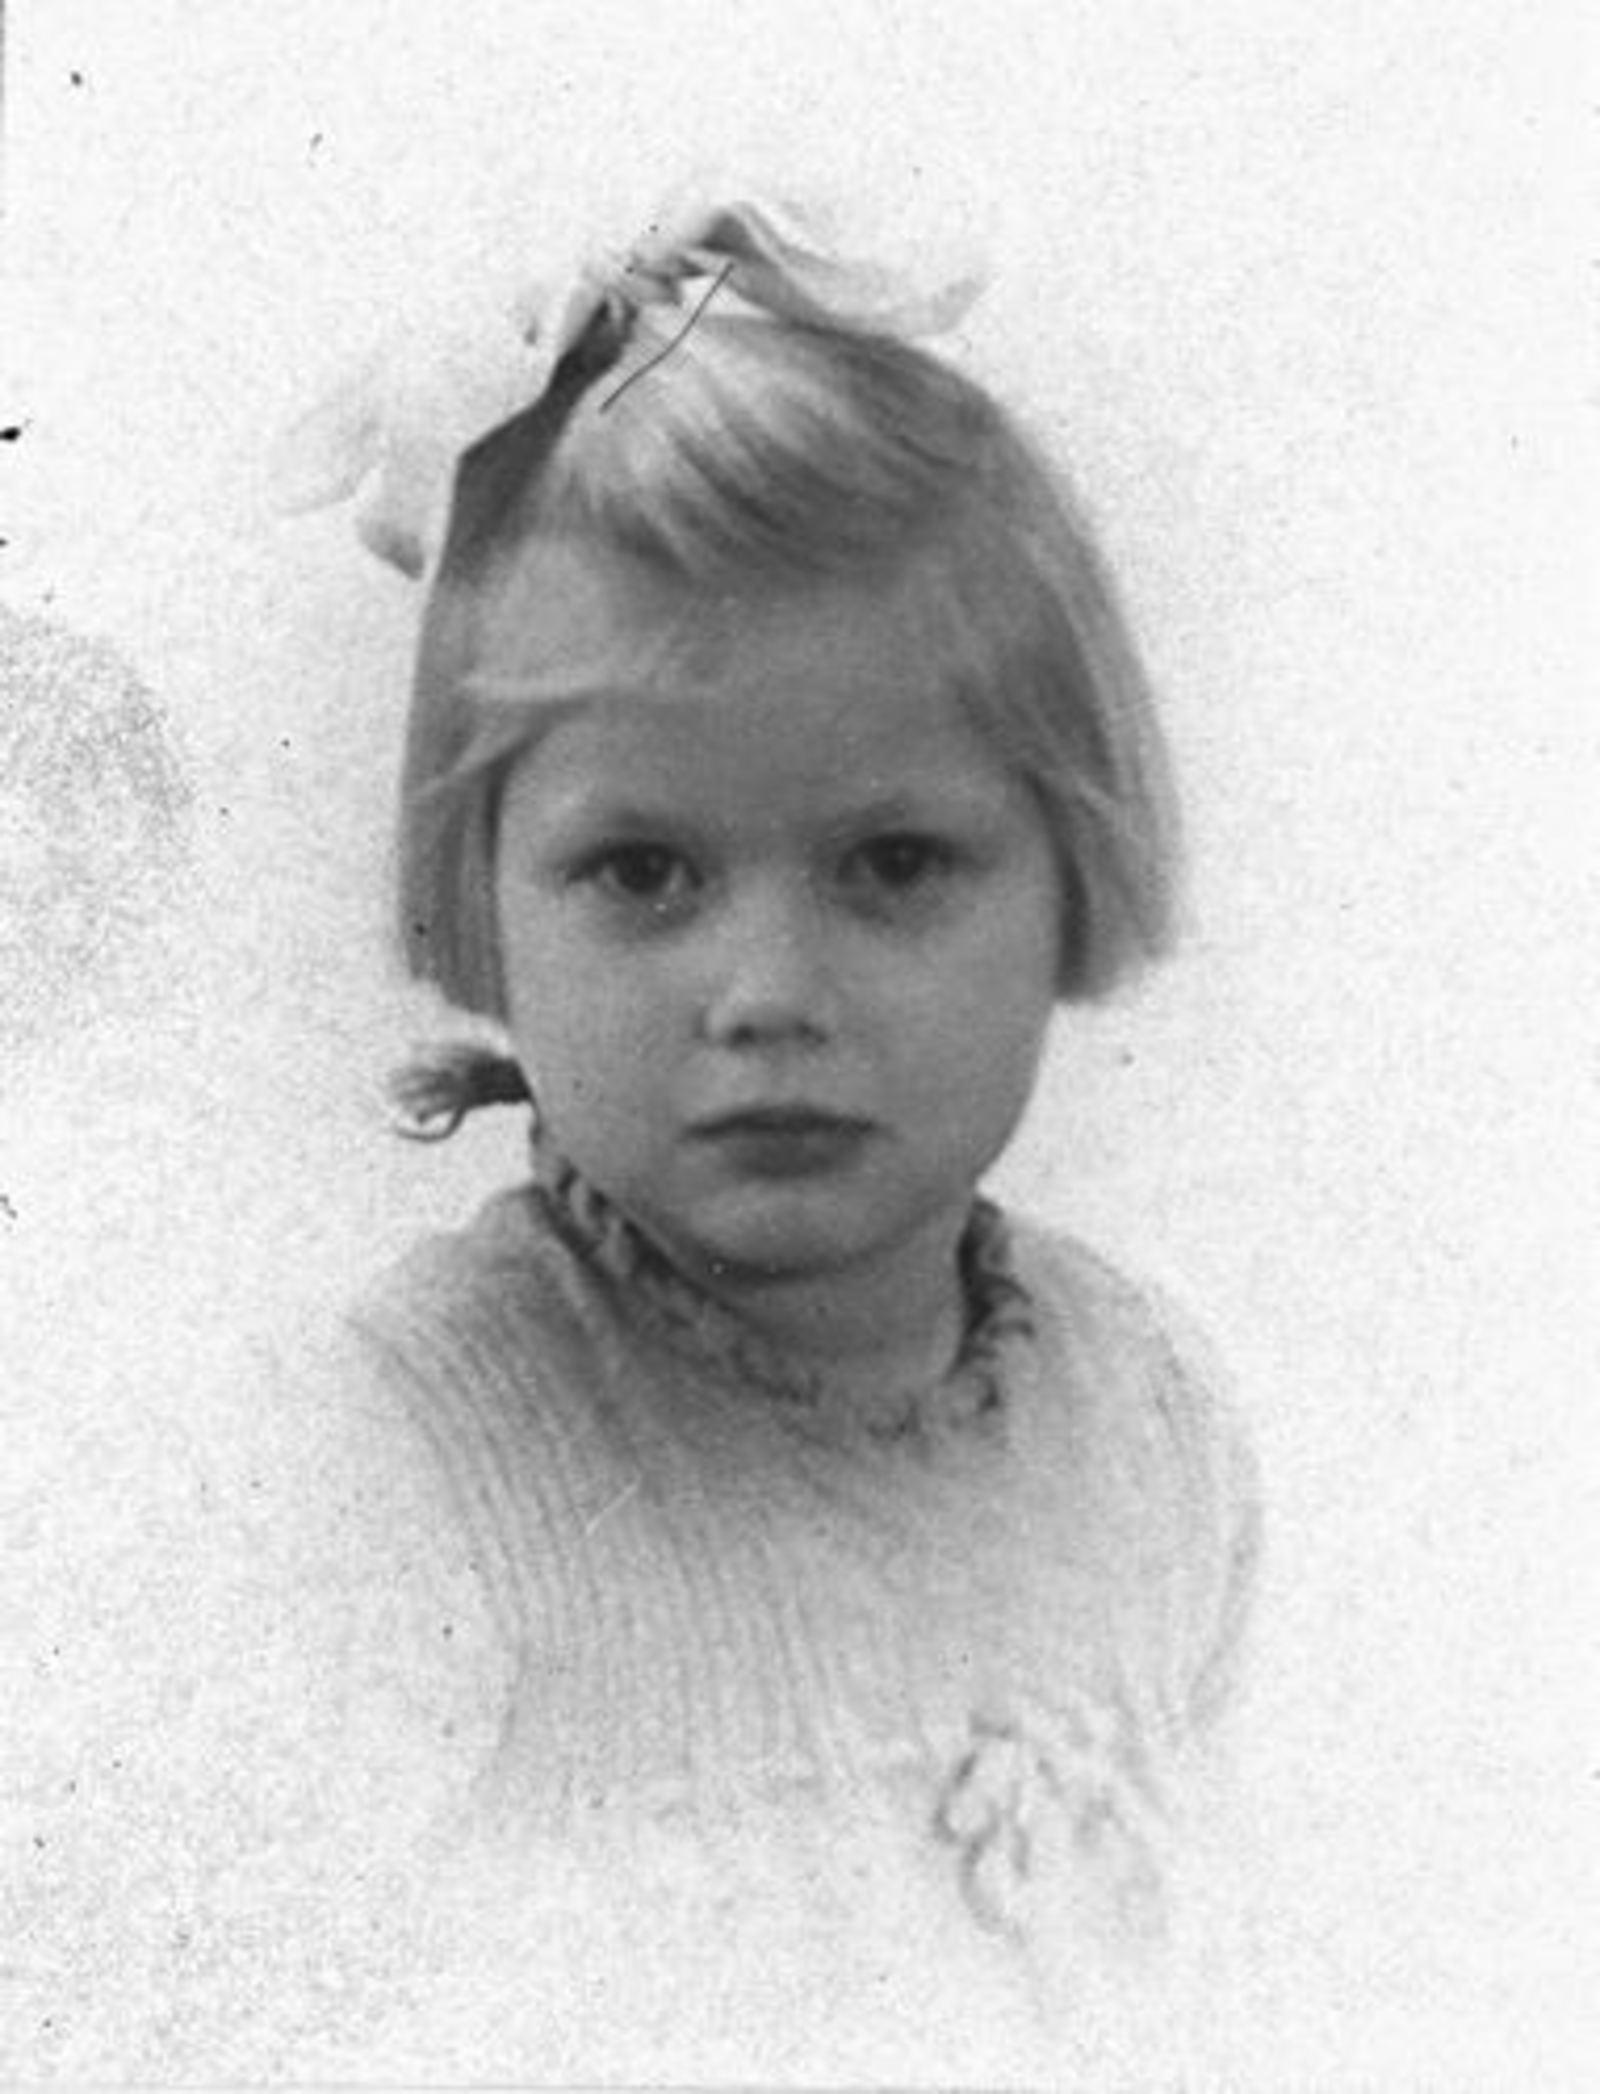 Dam Pieter 1926 19__ Dochter Els Portret